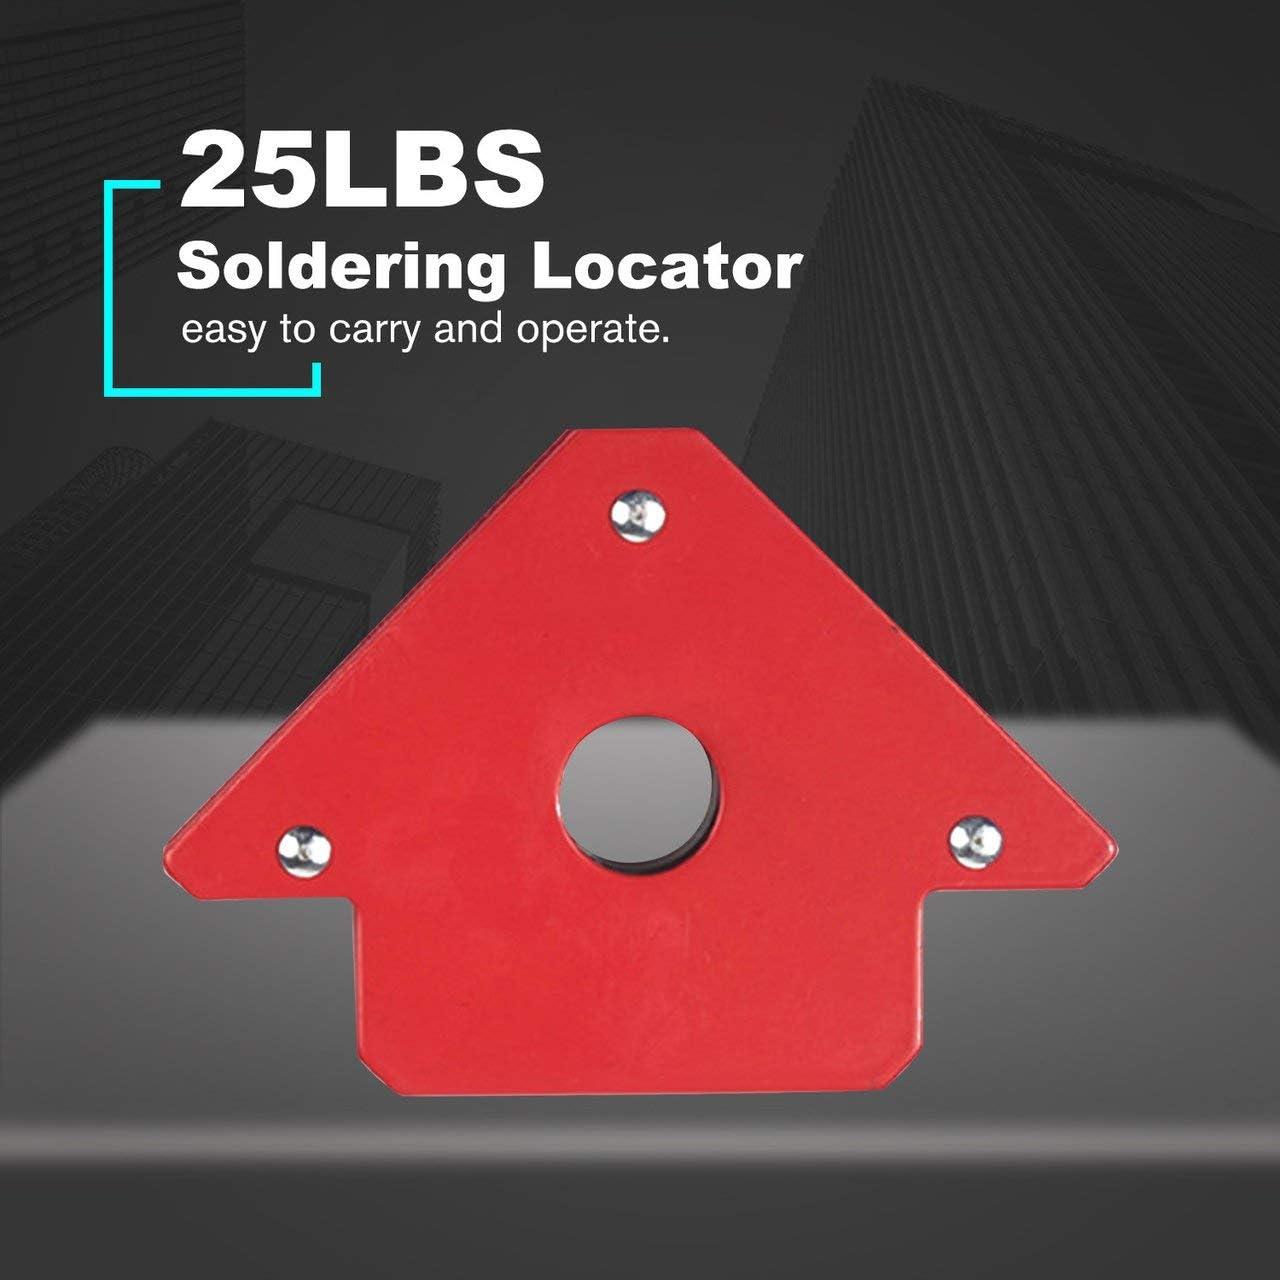 75LB Magnetschwei/ßhalter 3-Winkel-Pfeilschwei/ßer Positionierer Elektrowerkzeug Zubeh/ör rot DEjasnyfall L/ötort 25LB 50LB